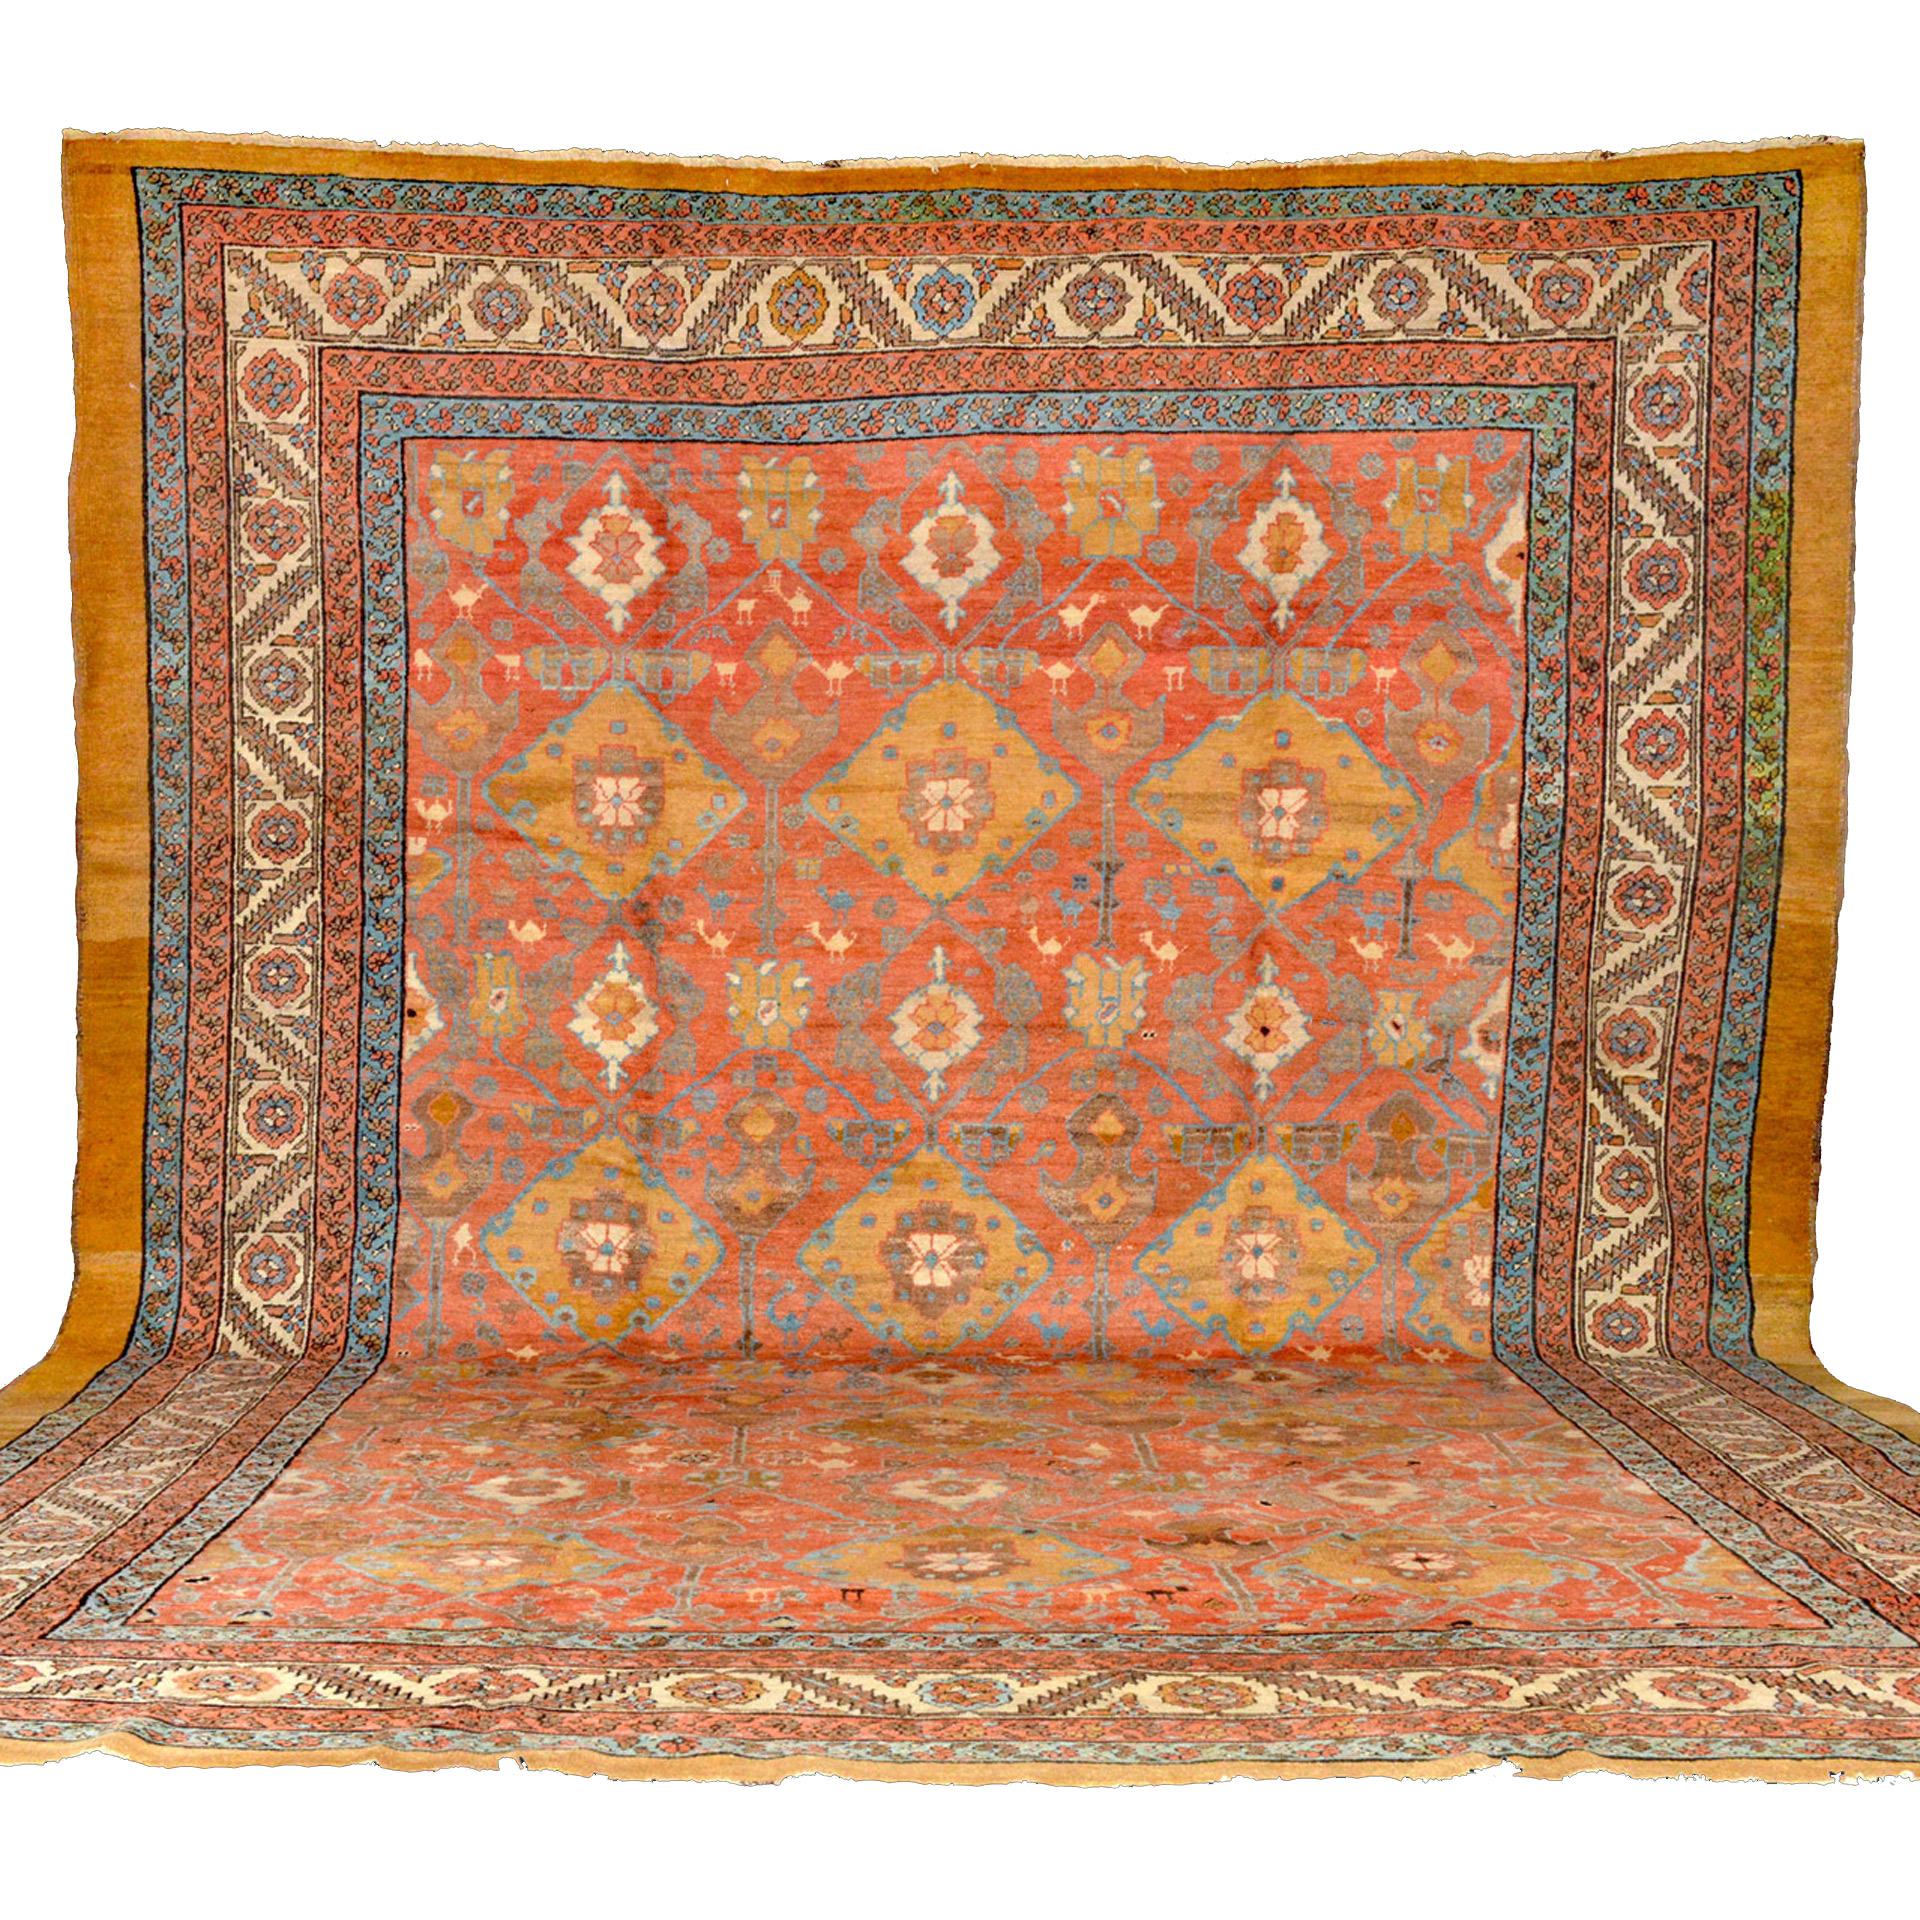 Antique northwest Persian Bakshaish carpet from Douglas Stock Gallery, antique Oriental rugs Boston,MA area